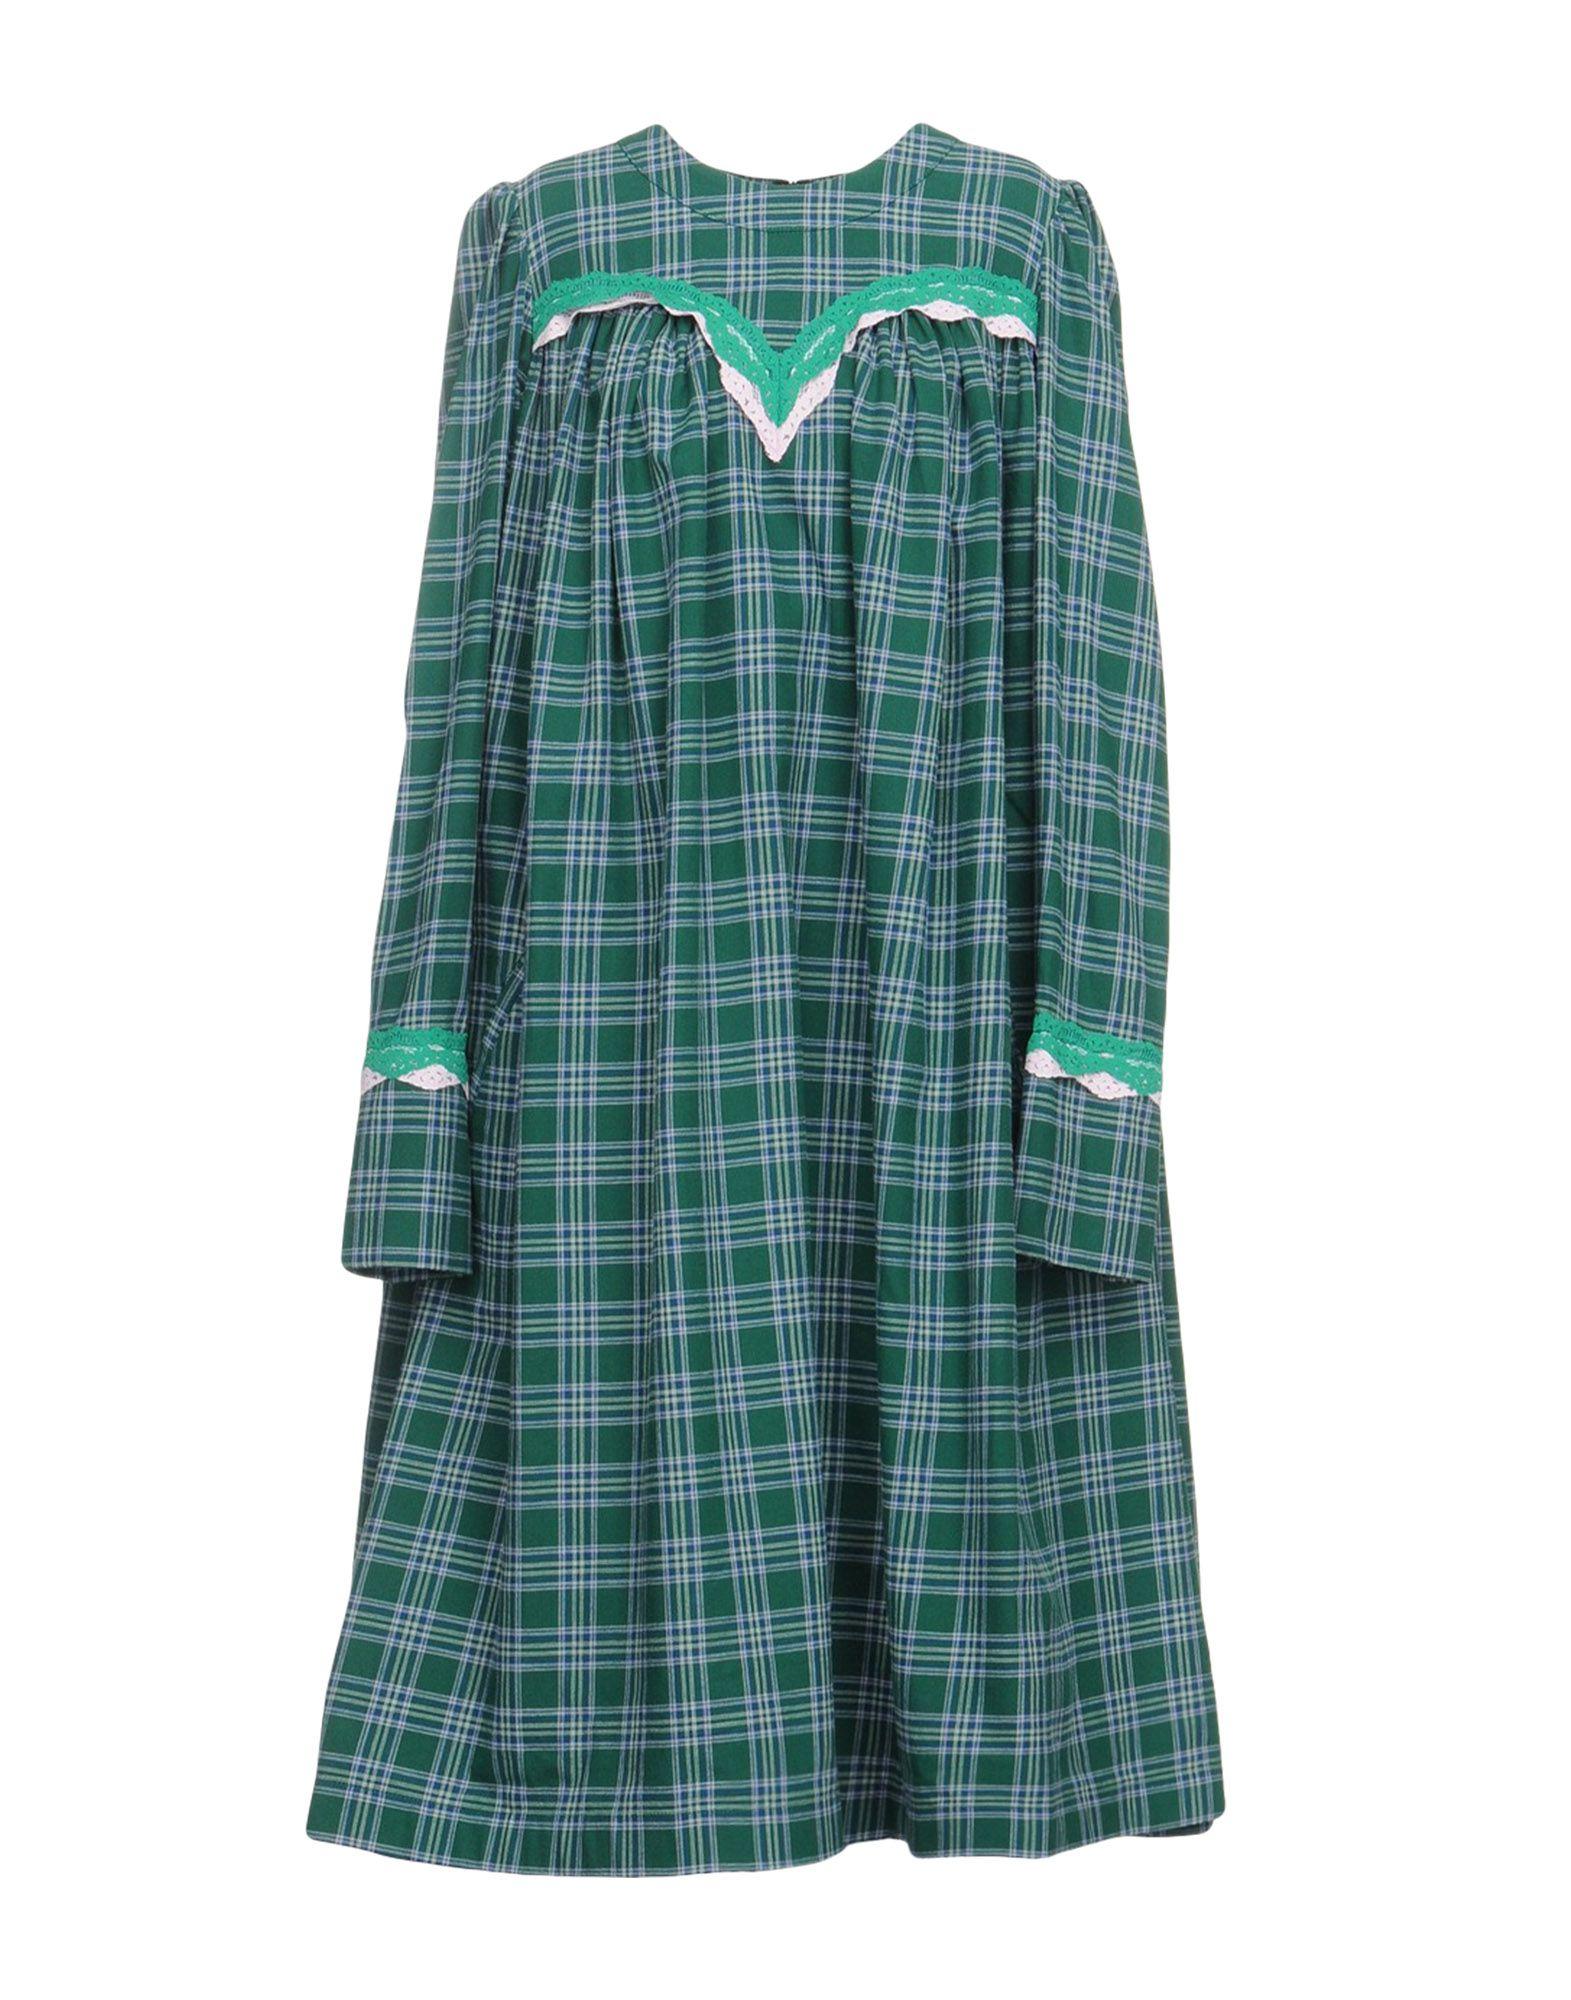 NATASHA ZINKO Платье длиной 3/4 natasha zinko длинное платье